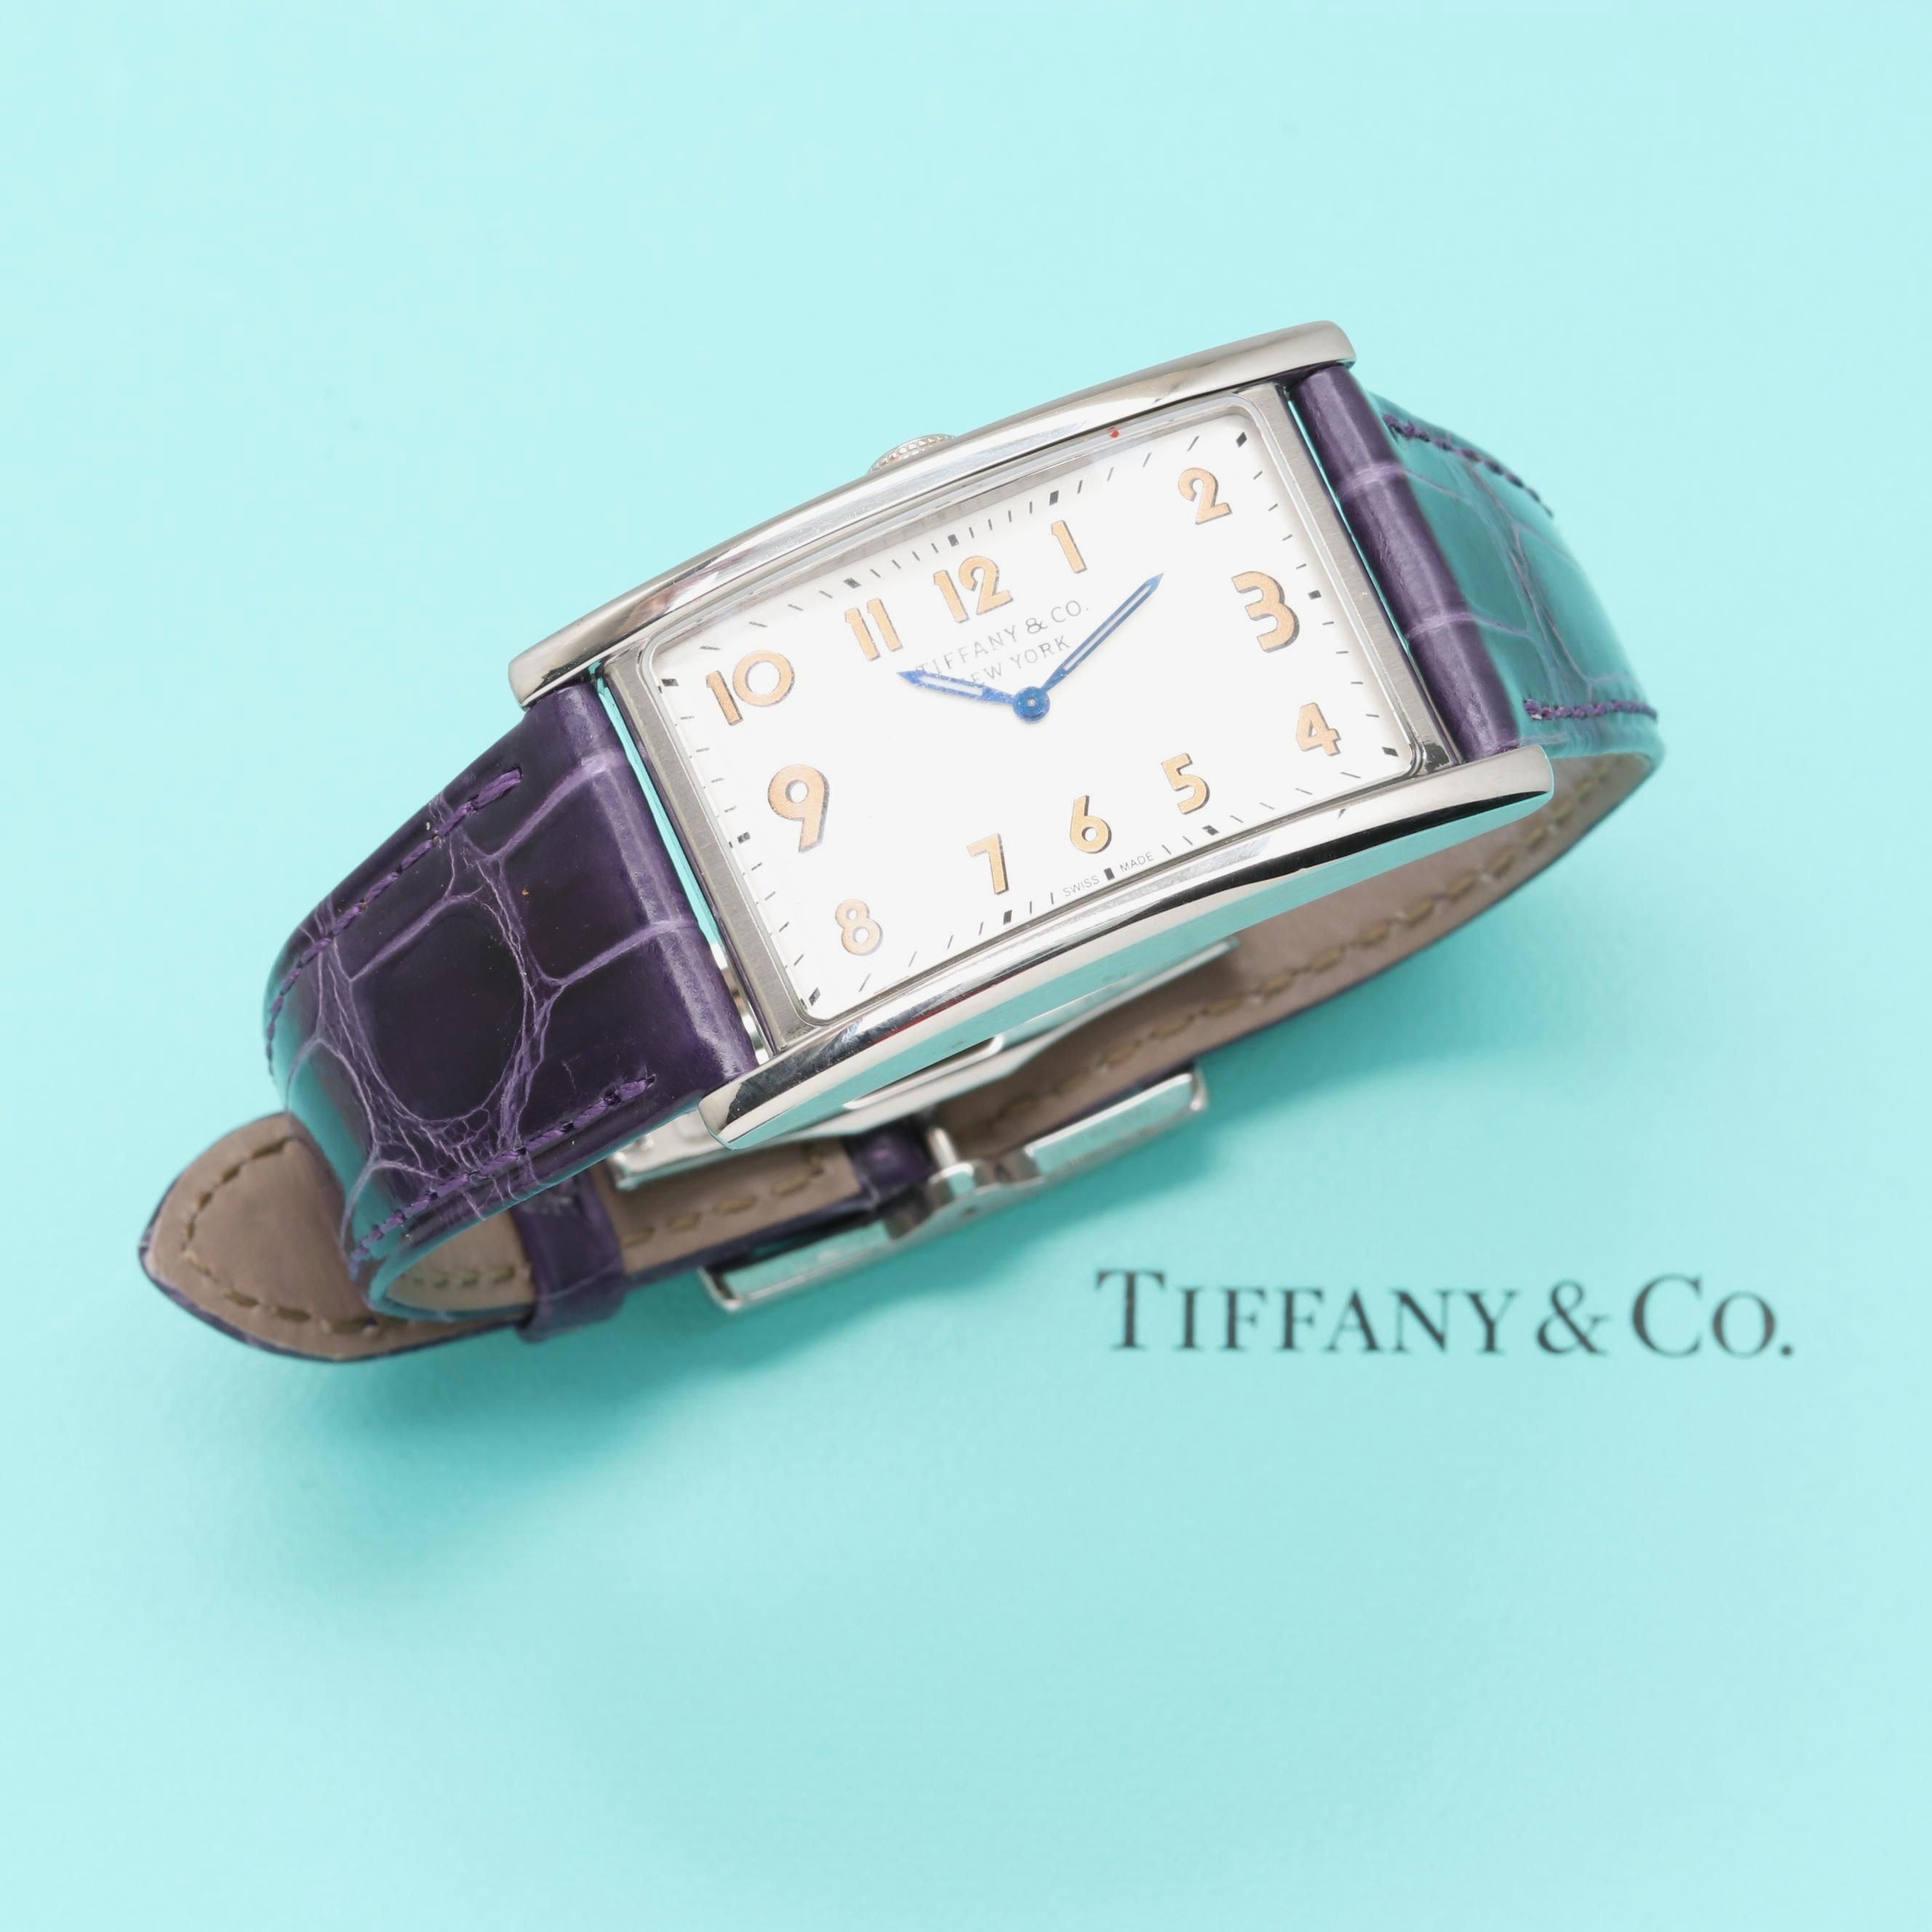 Tiffany & Co. East West Quartz Wristwatch